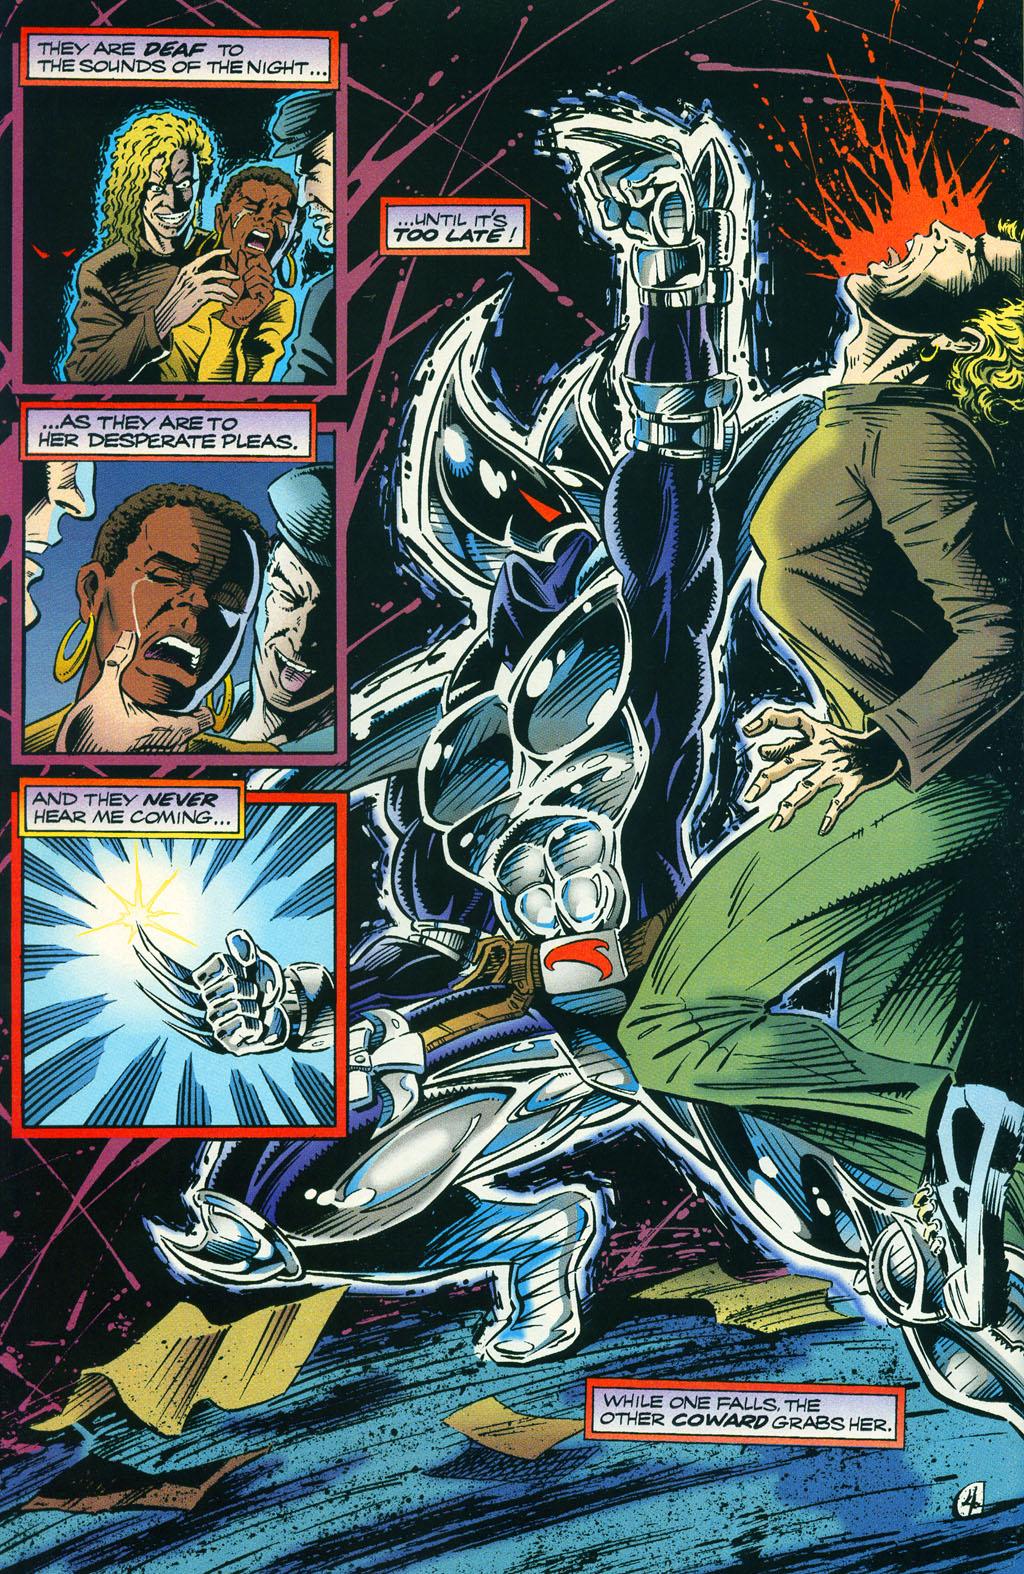 Read online ShadowHawk comic -  Issue #5 - 8